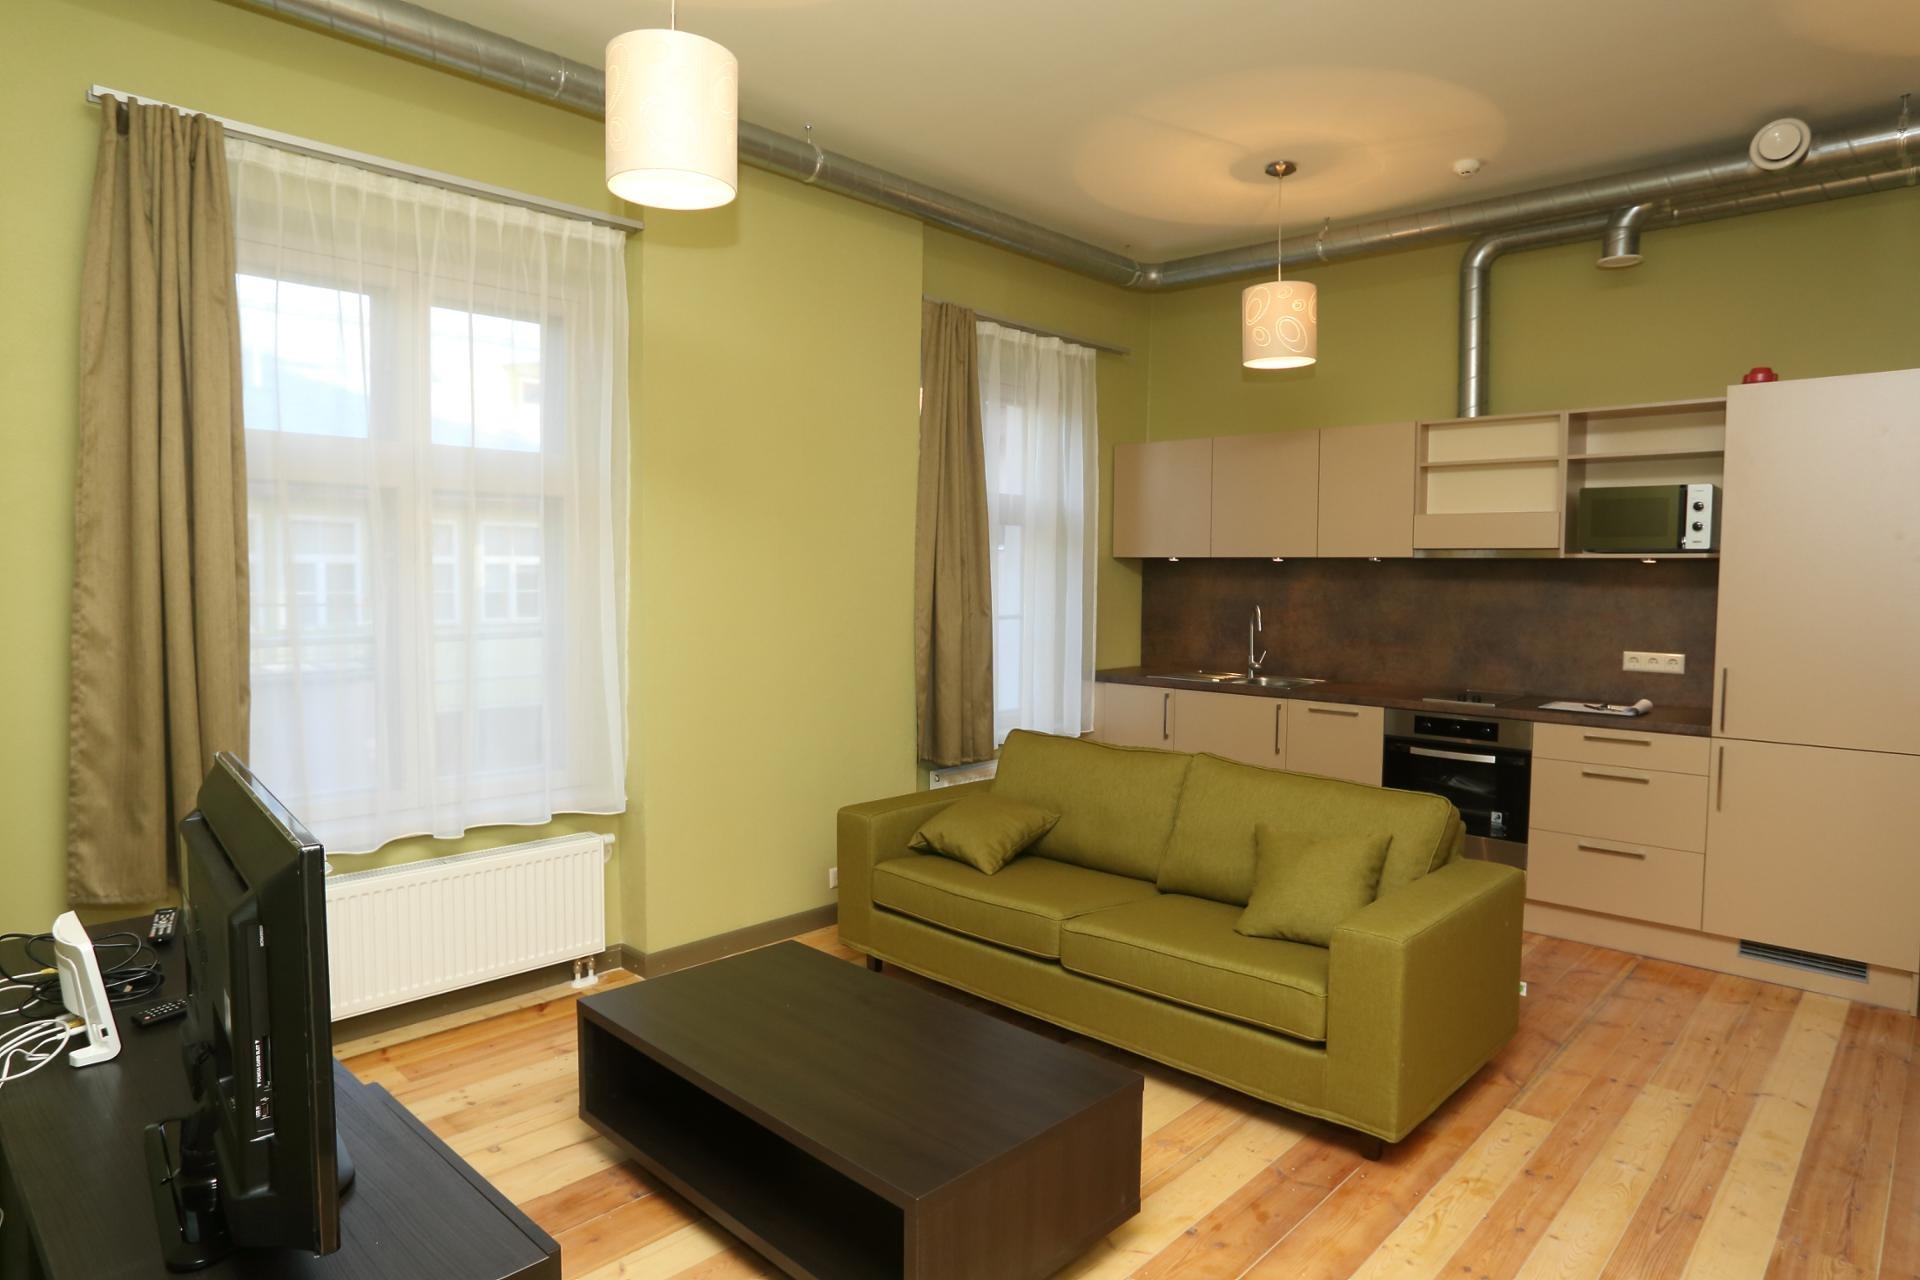 1 Room Rental Apartment. Livin. Part 82